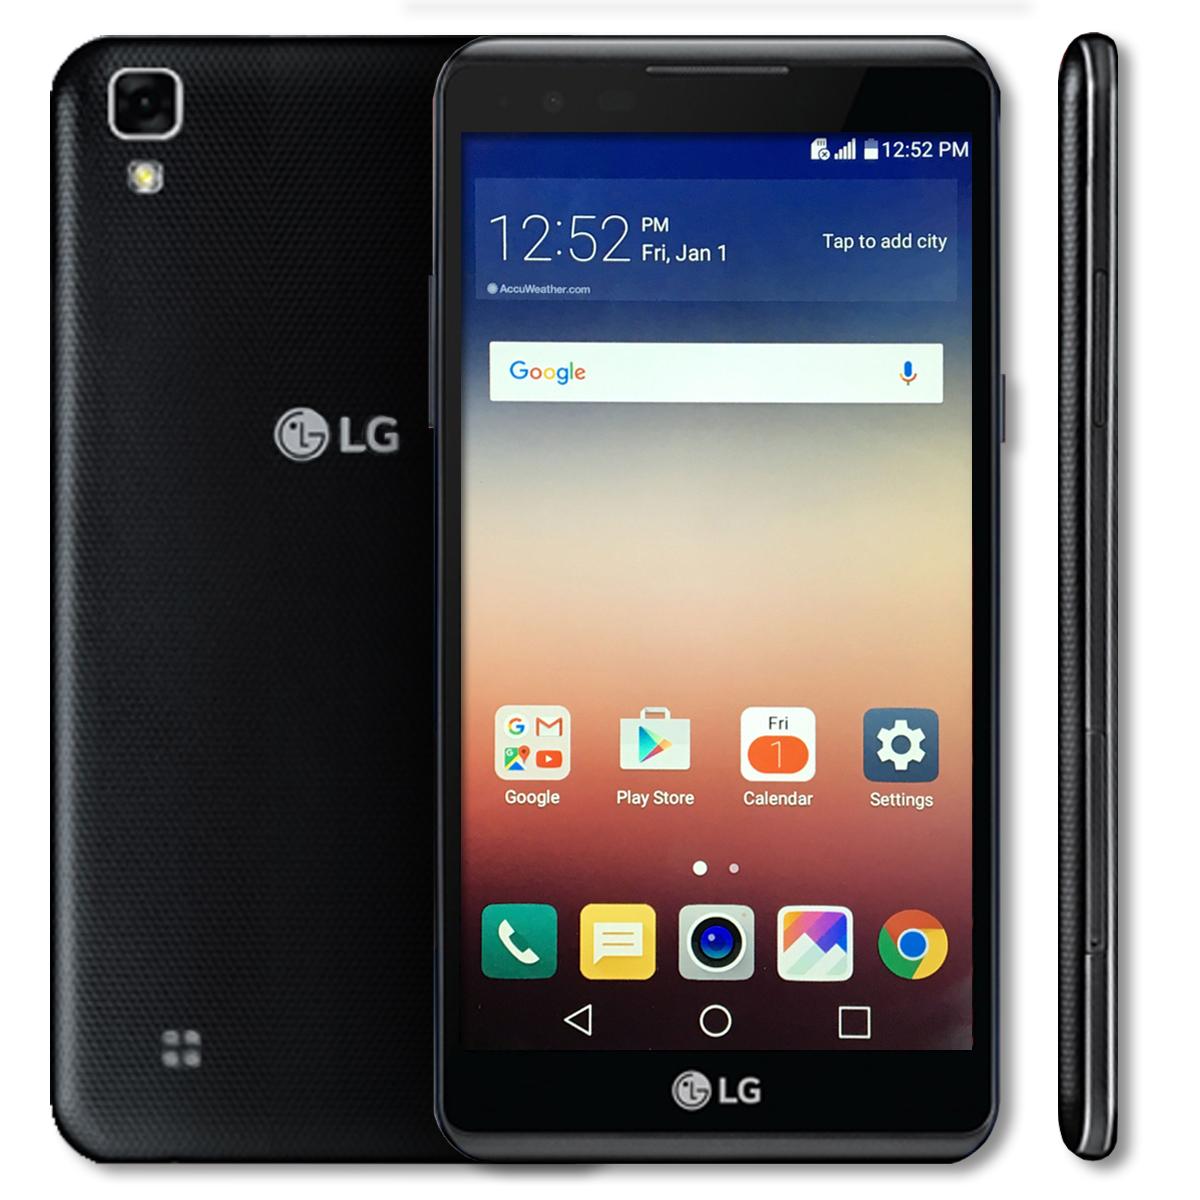 lg x power 16gb lte unlocked smartphone black lgus610 at t t mobile verizon ebay. Black Bedroom Furniture Sets. Home Design Ideas